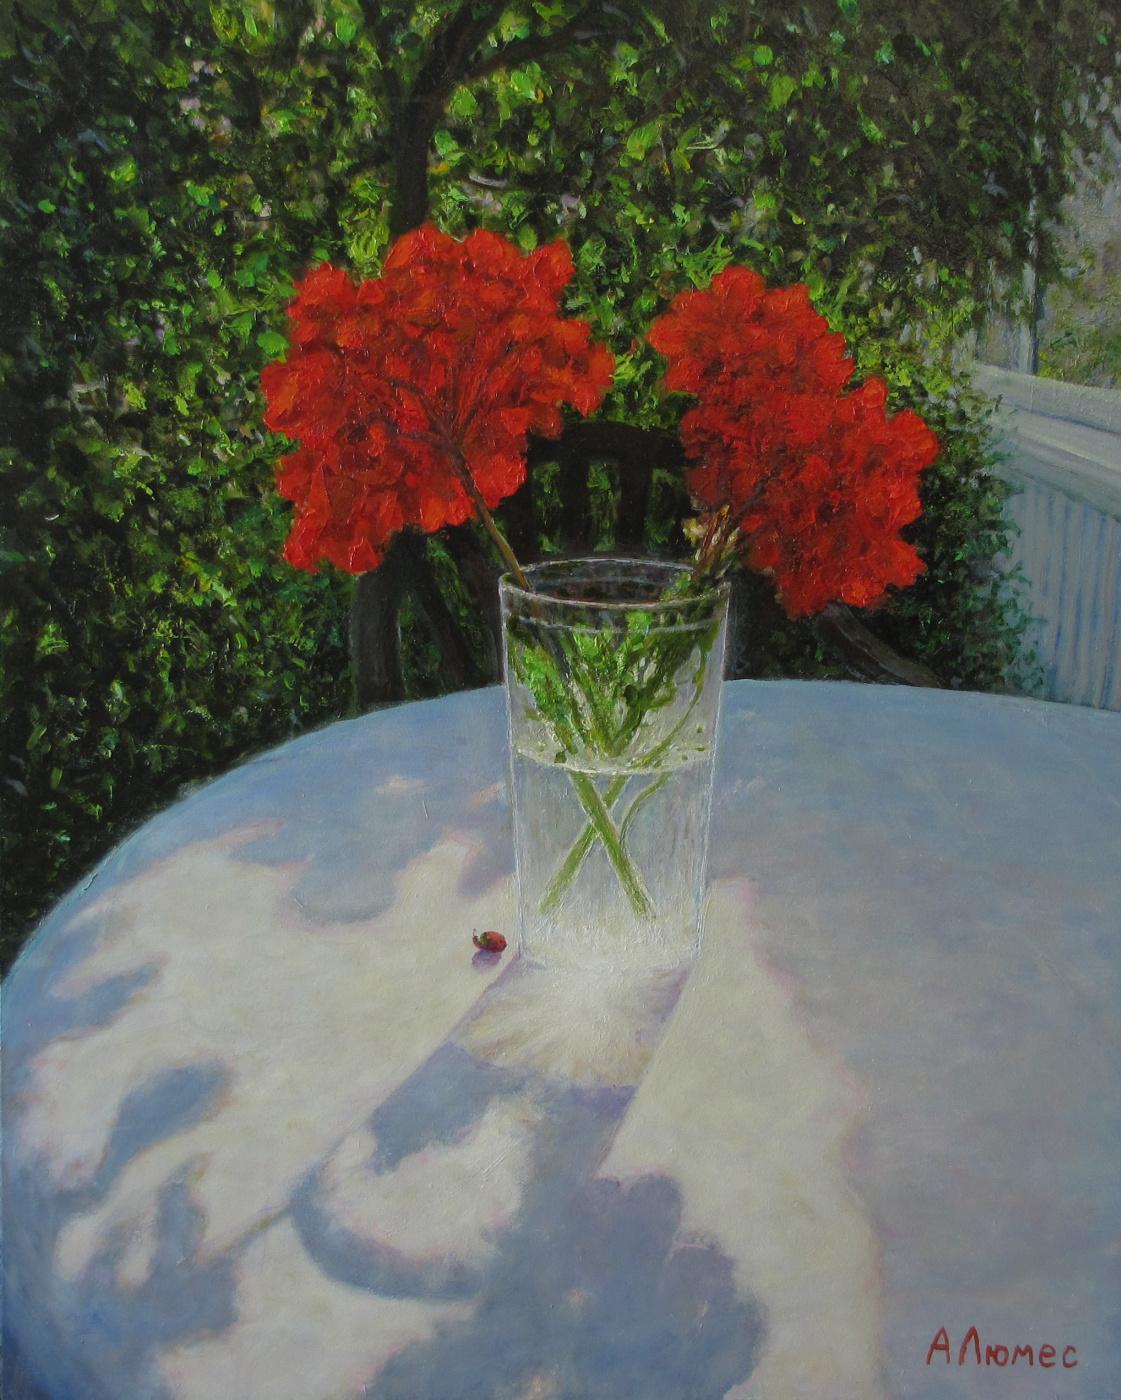 Andrew Lumez. Neighbor geranium